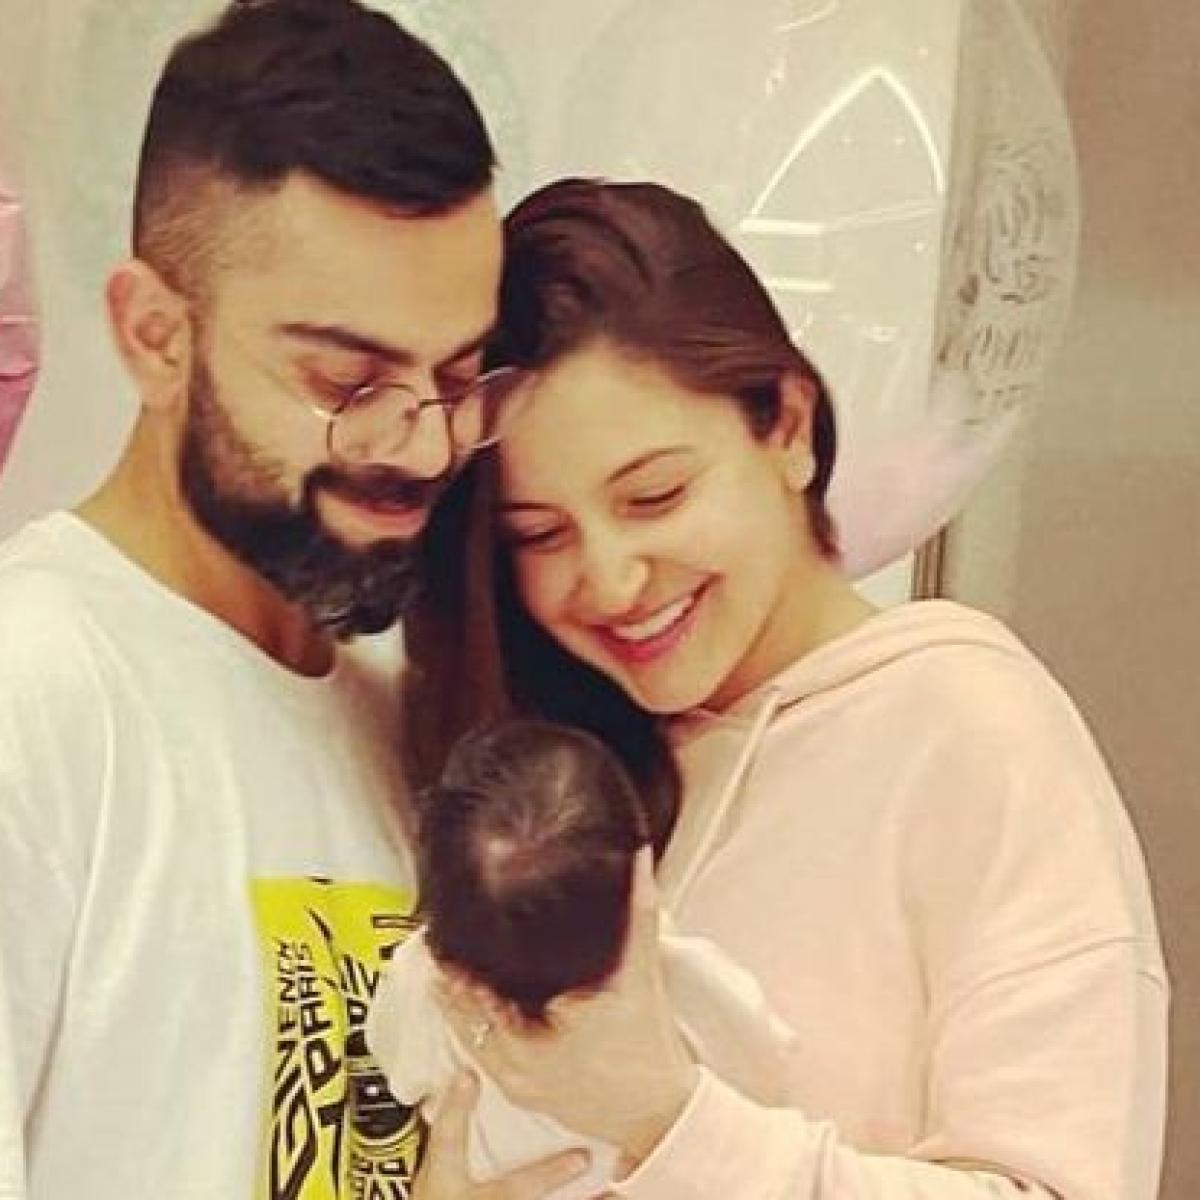 Here's why Anushka Sharma, Virat Kohli are not sharing daughter Vamika's pictures on social media